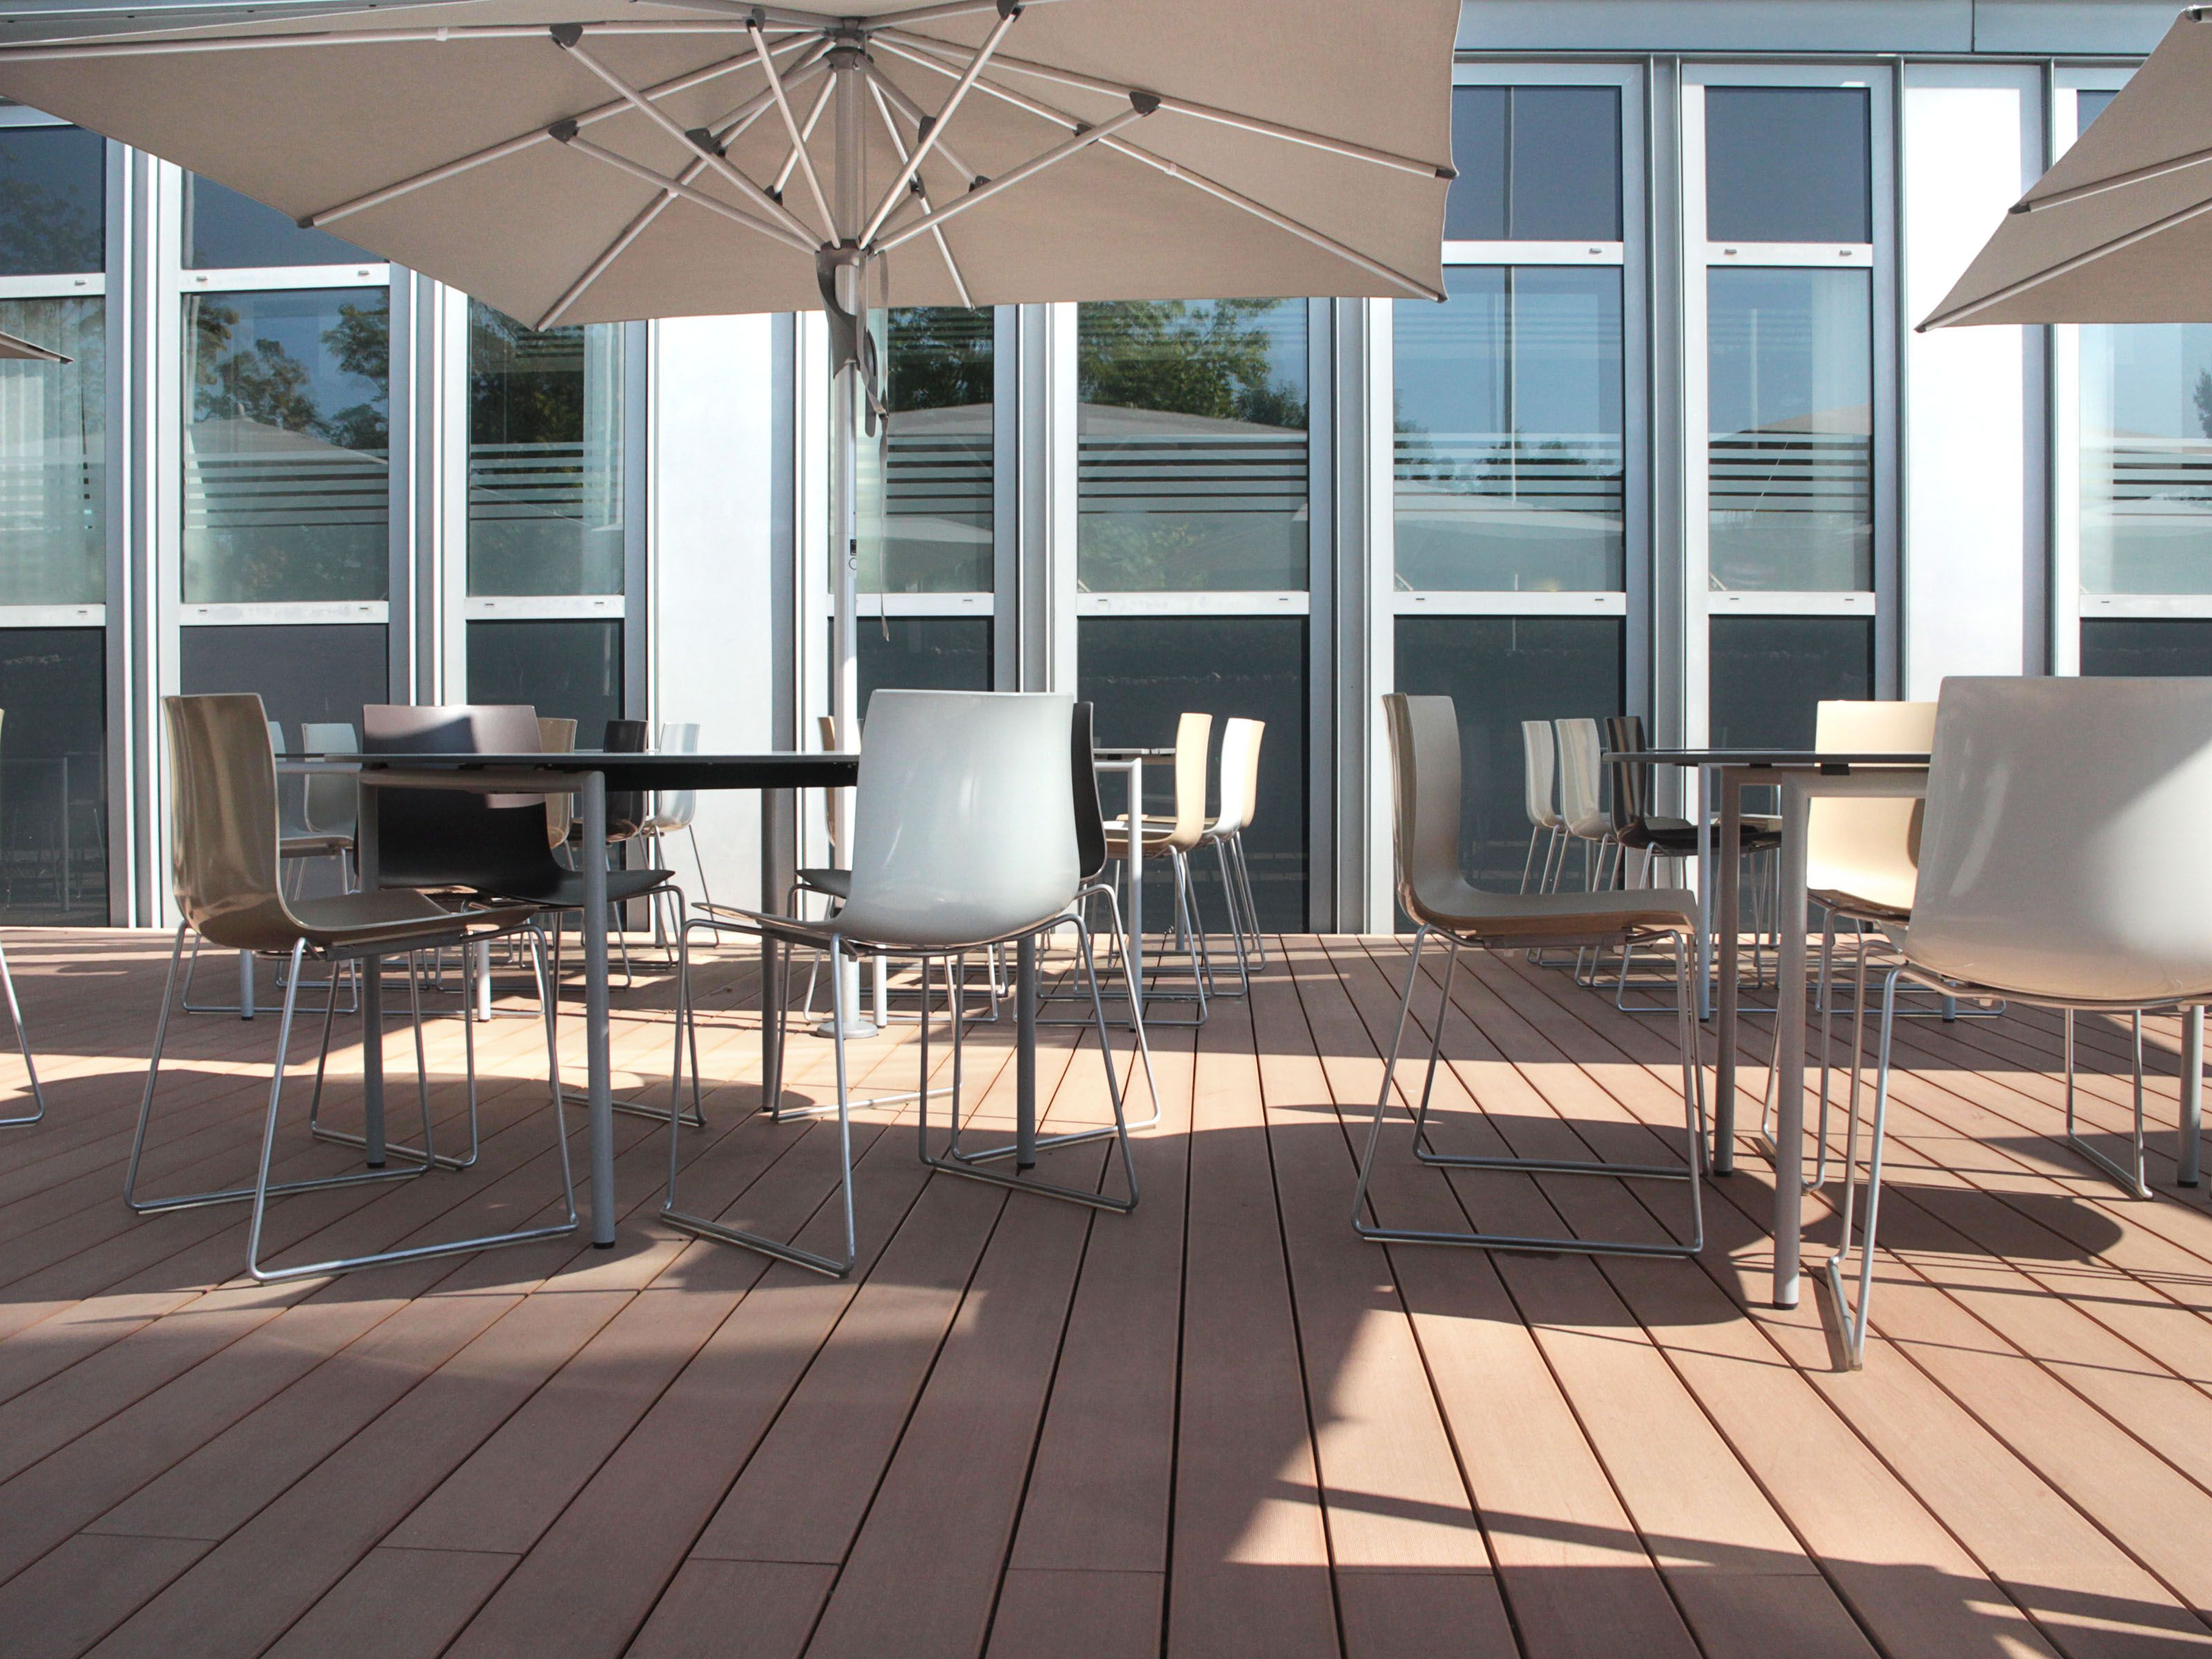 Wetterfeste Terrassendielen aus Holz + Kunststoff   Terrassenbelag ...